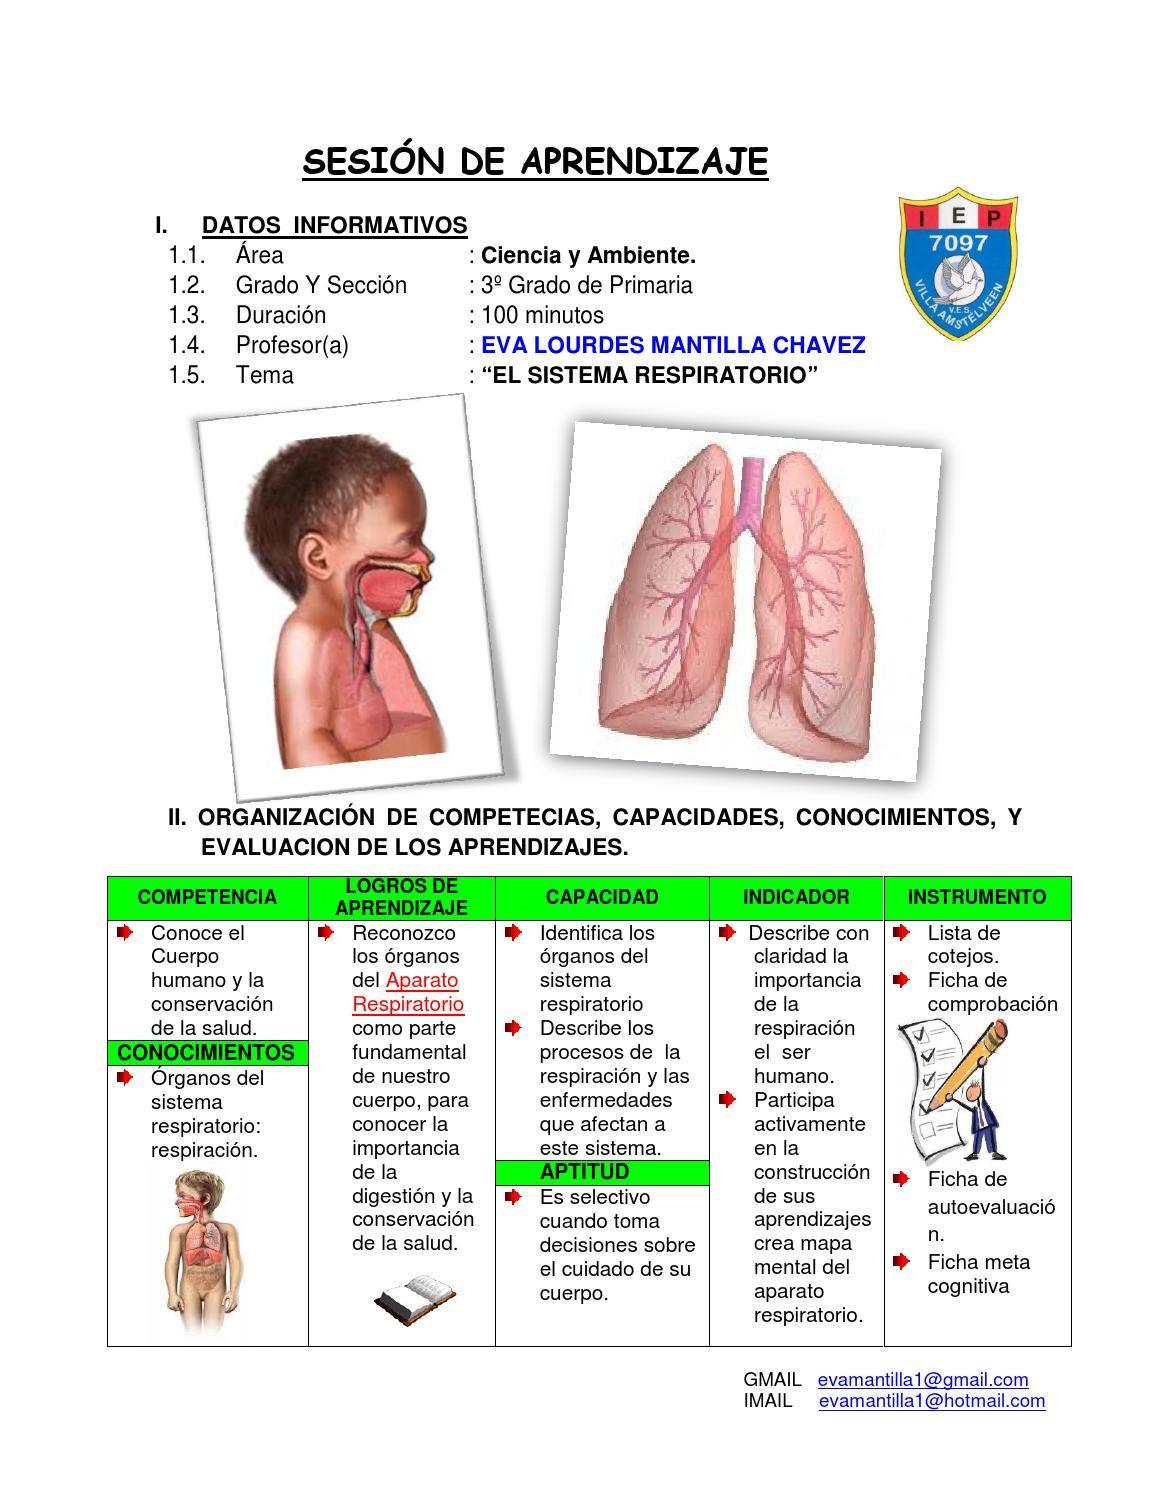 Sistema Respiratorio by EVA LOURDES MANTILLA CHAVEZ - issuu